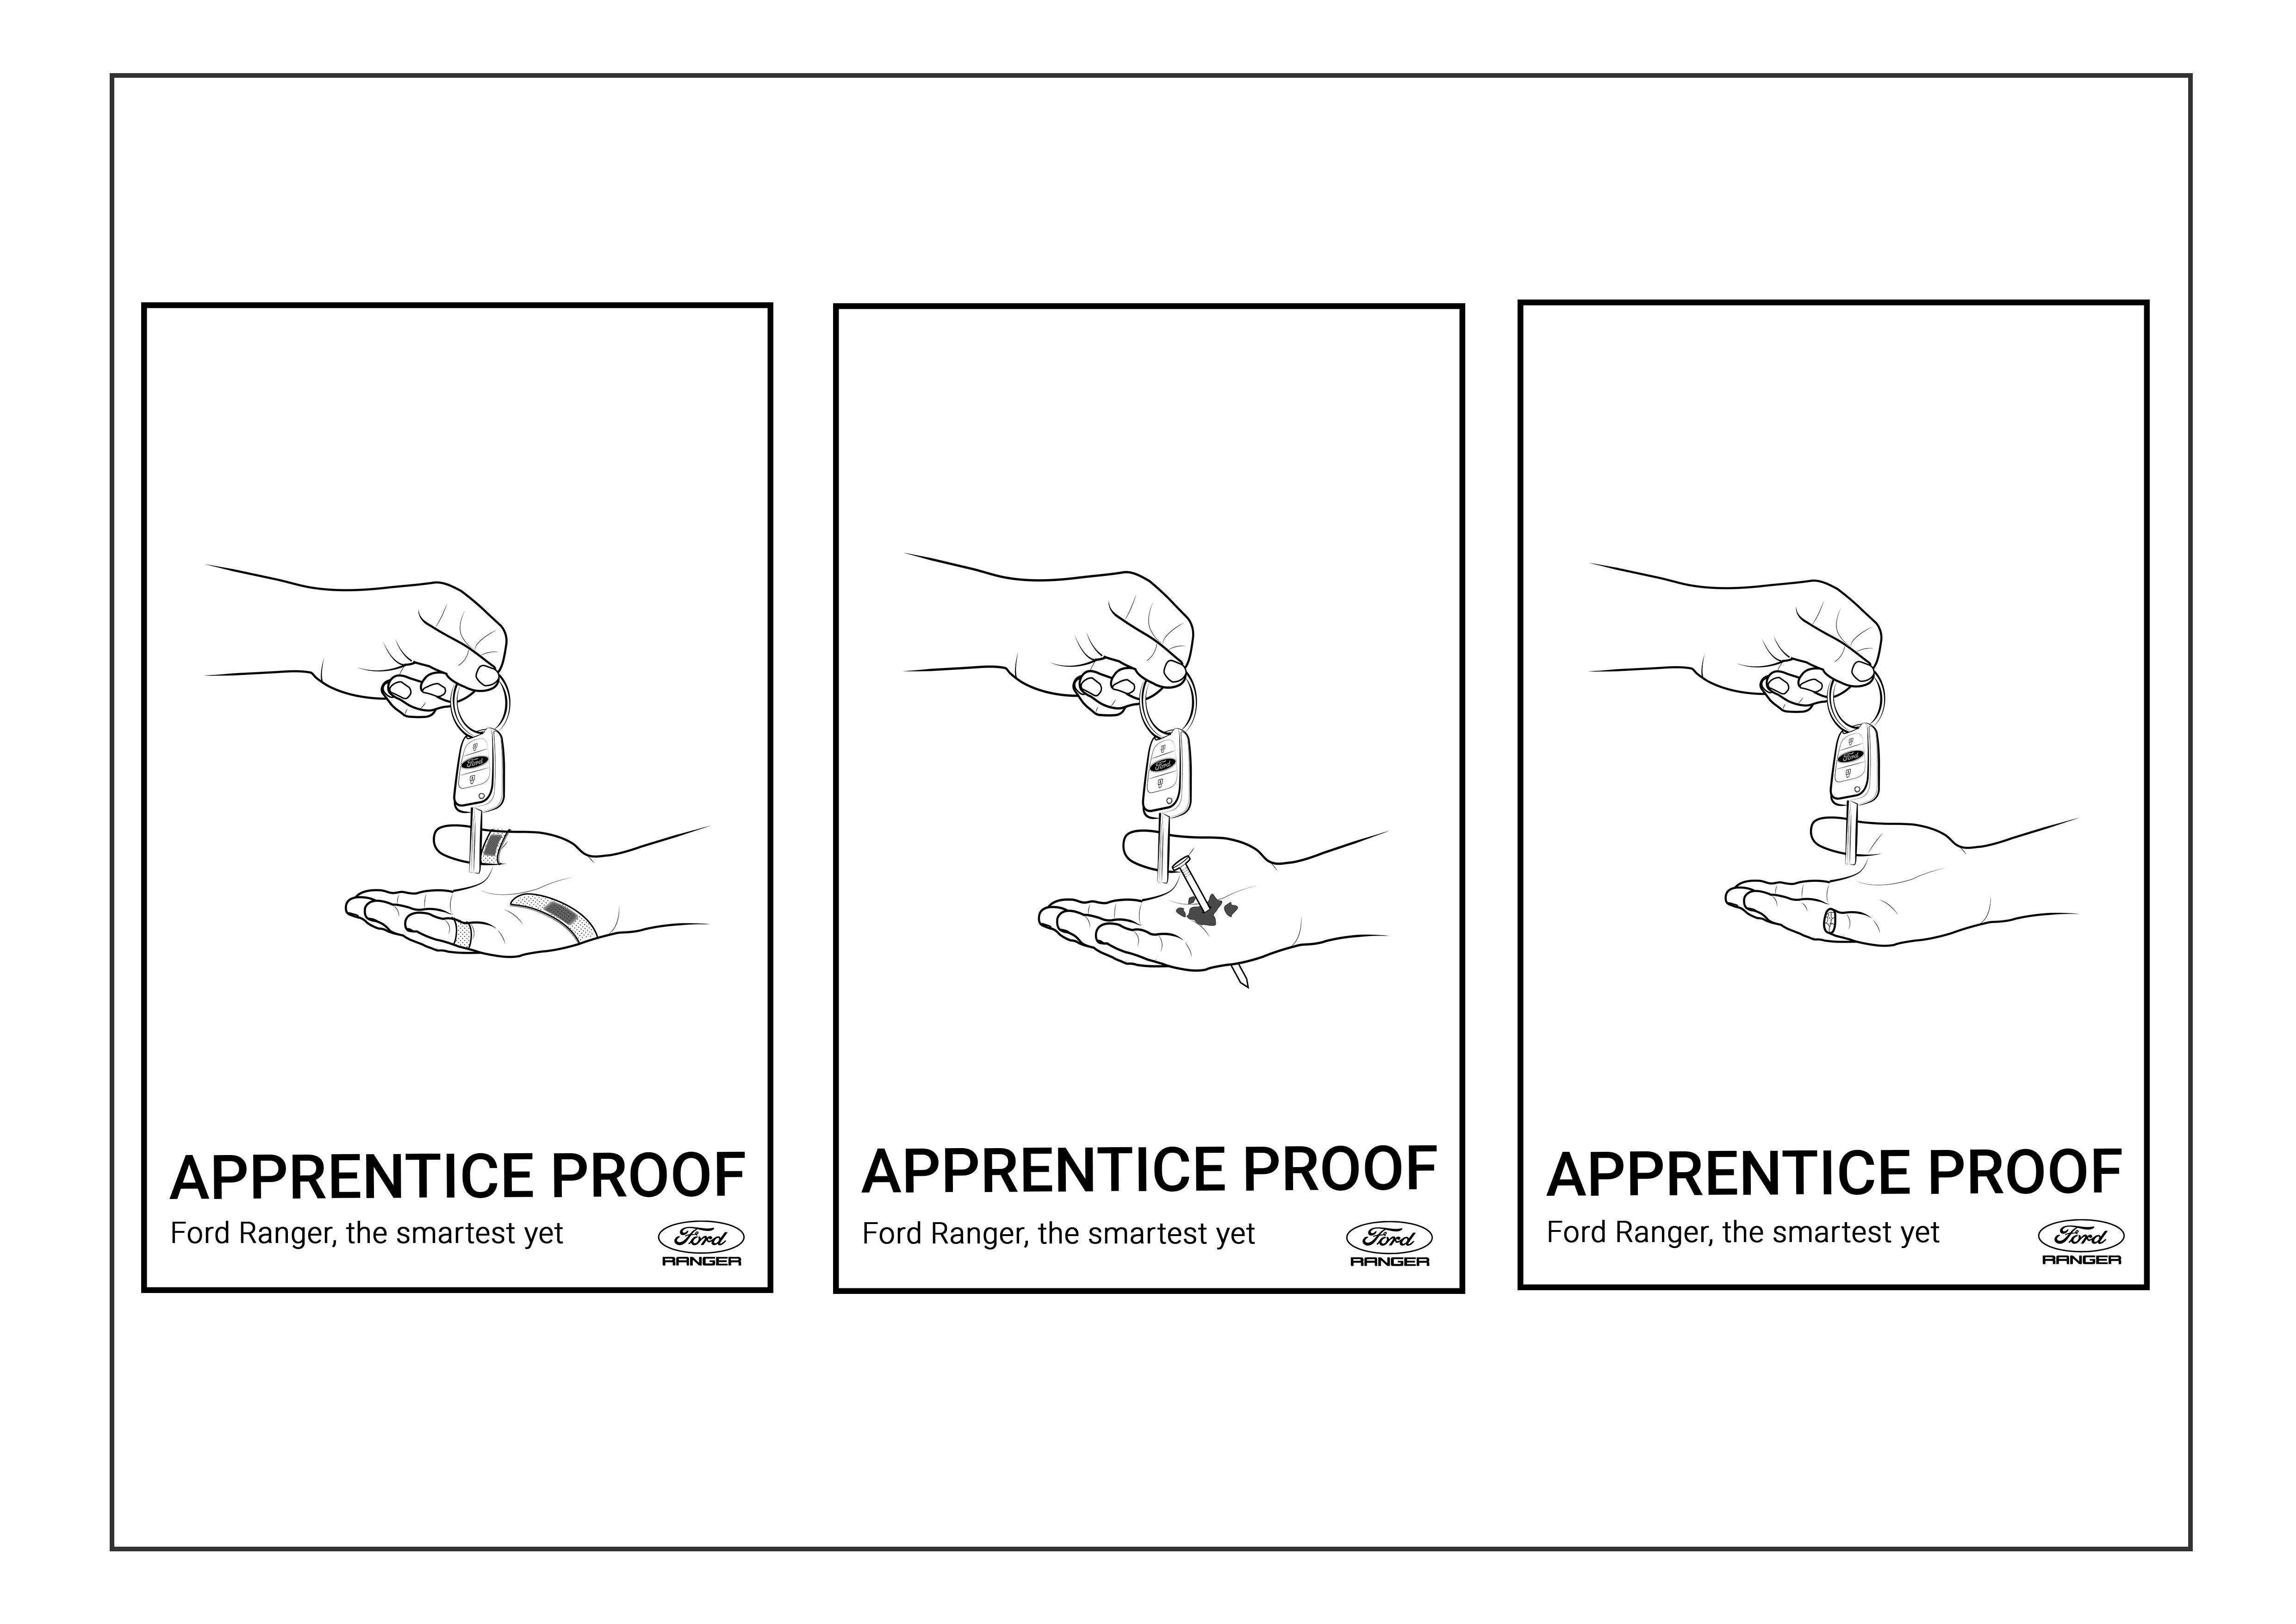 Apprentice Proof (Elizabeth Graydon)